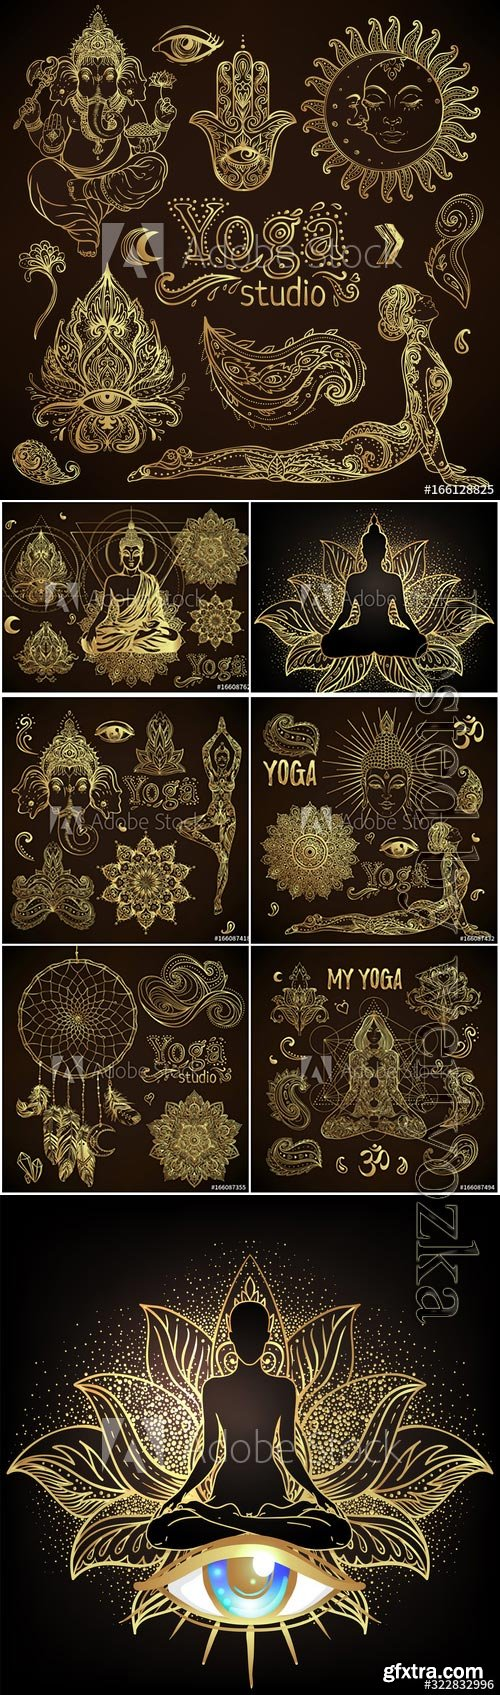 Yoga, meditation vector illustration set, hindu paisley motifs, Buddha silhouette